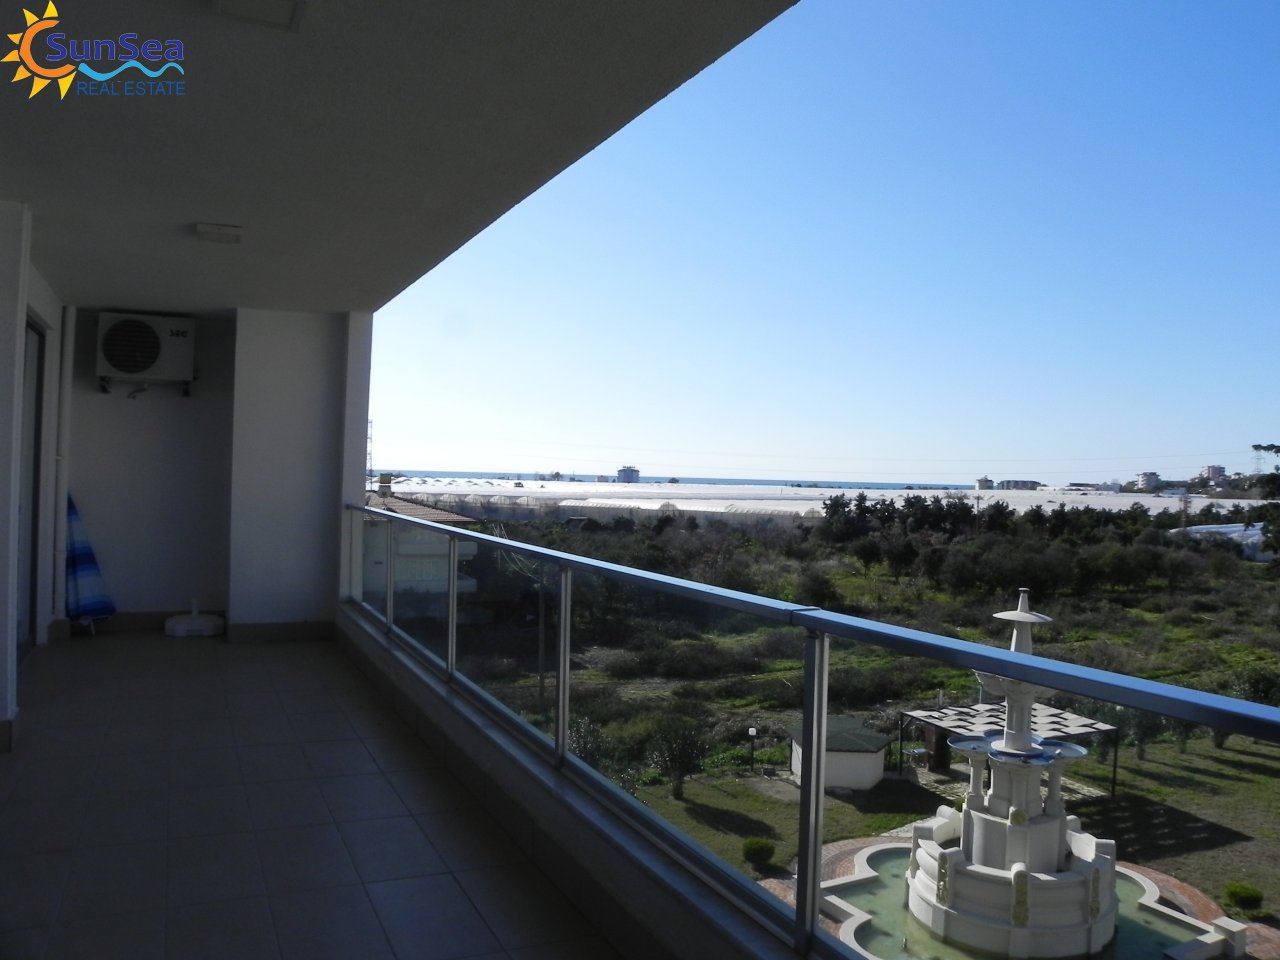 ALANYA Fortuna Resort view